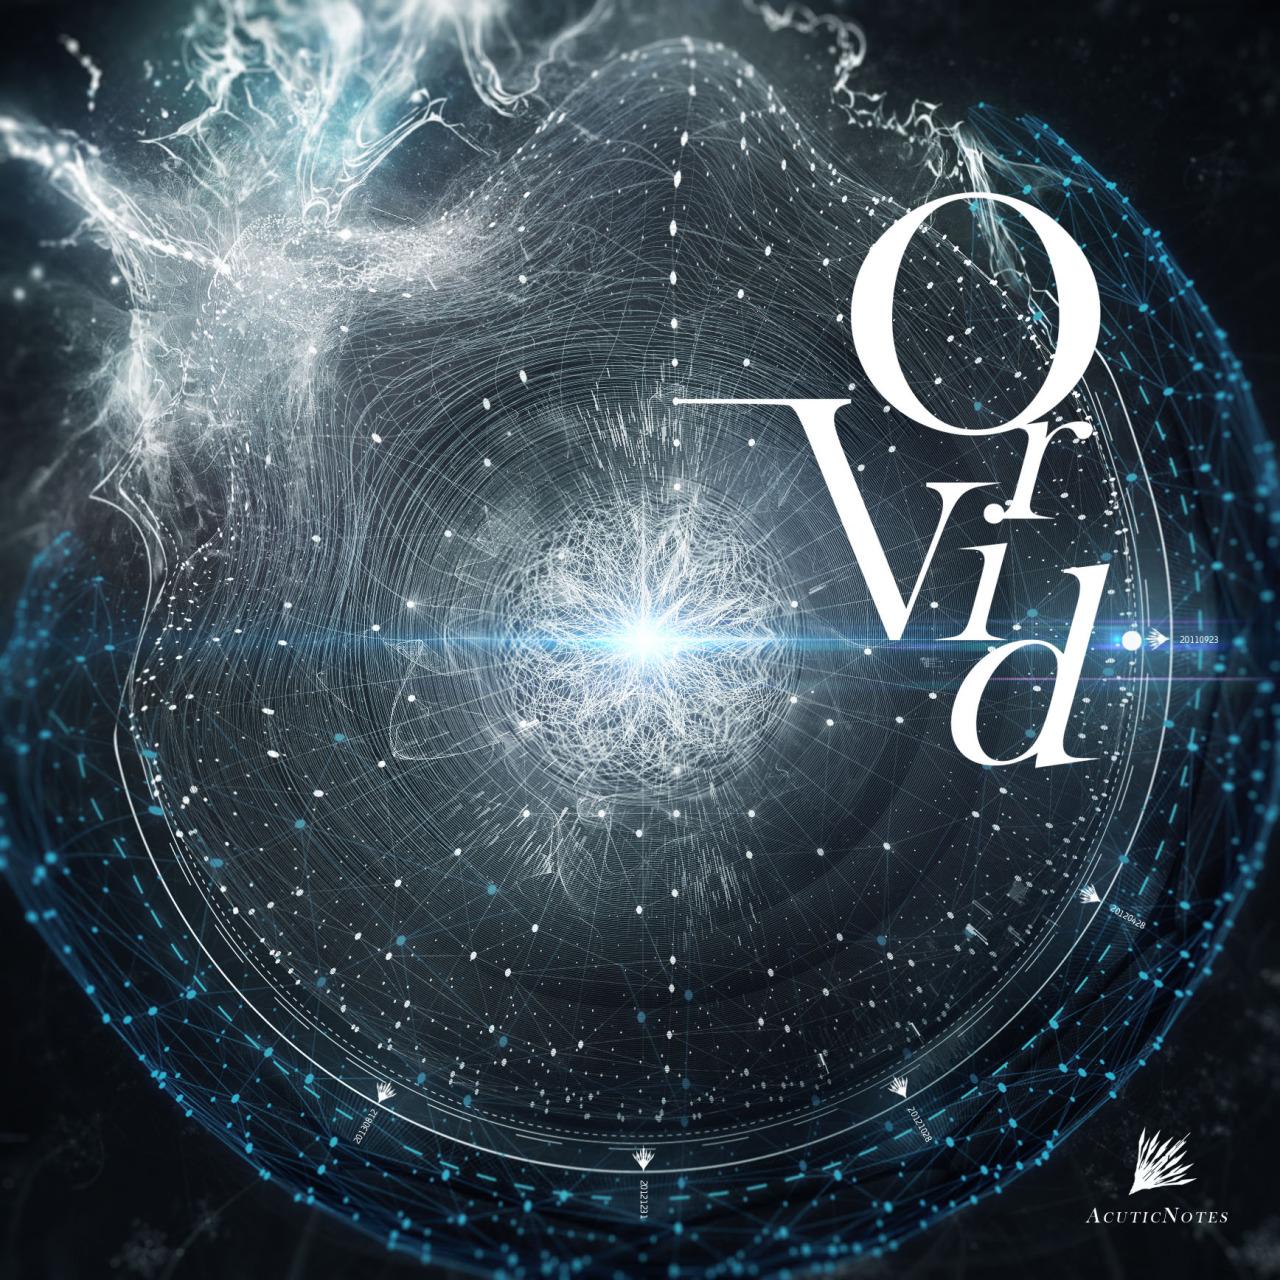 OrVid